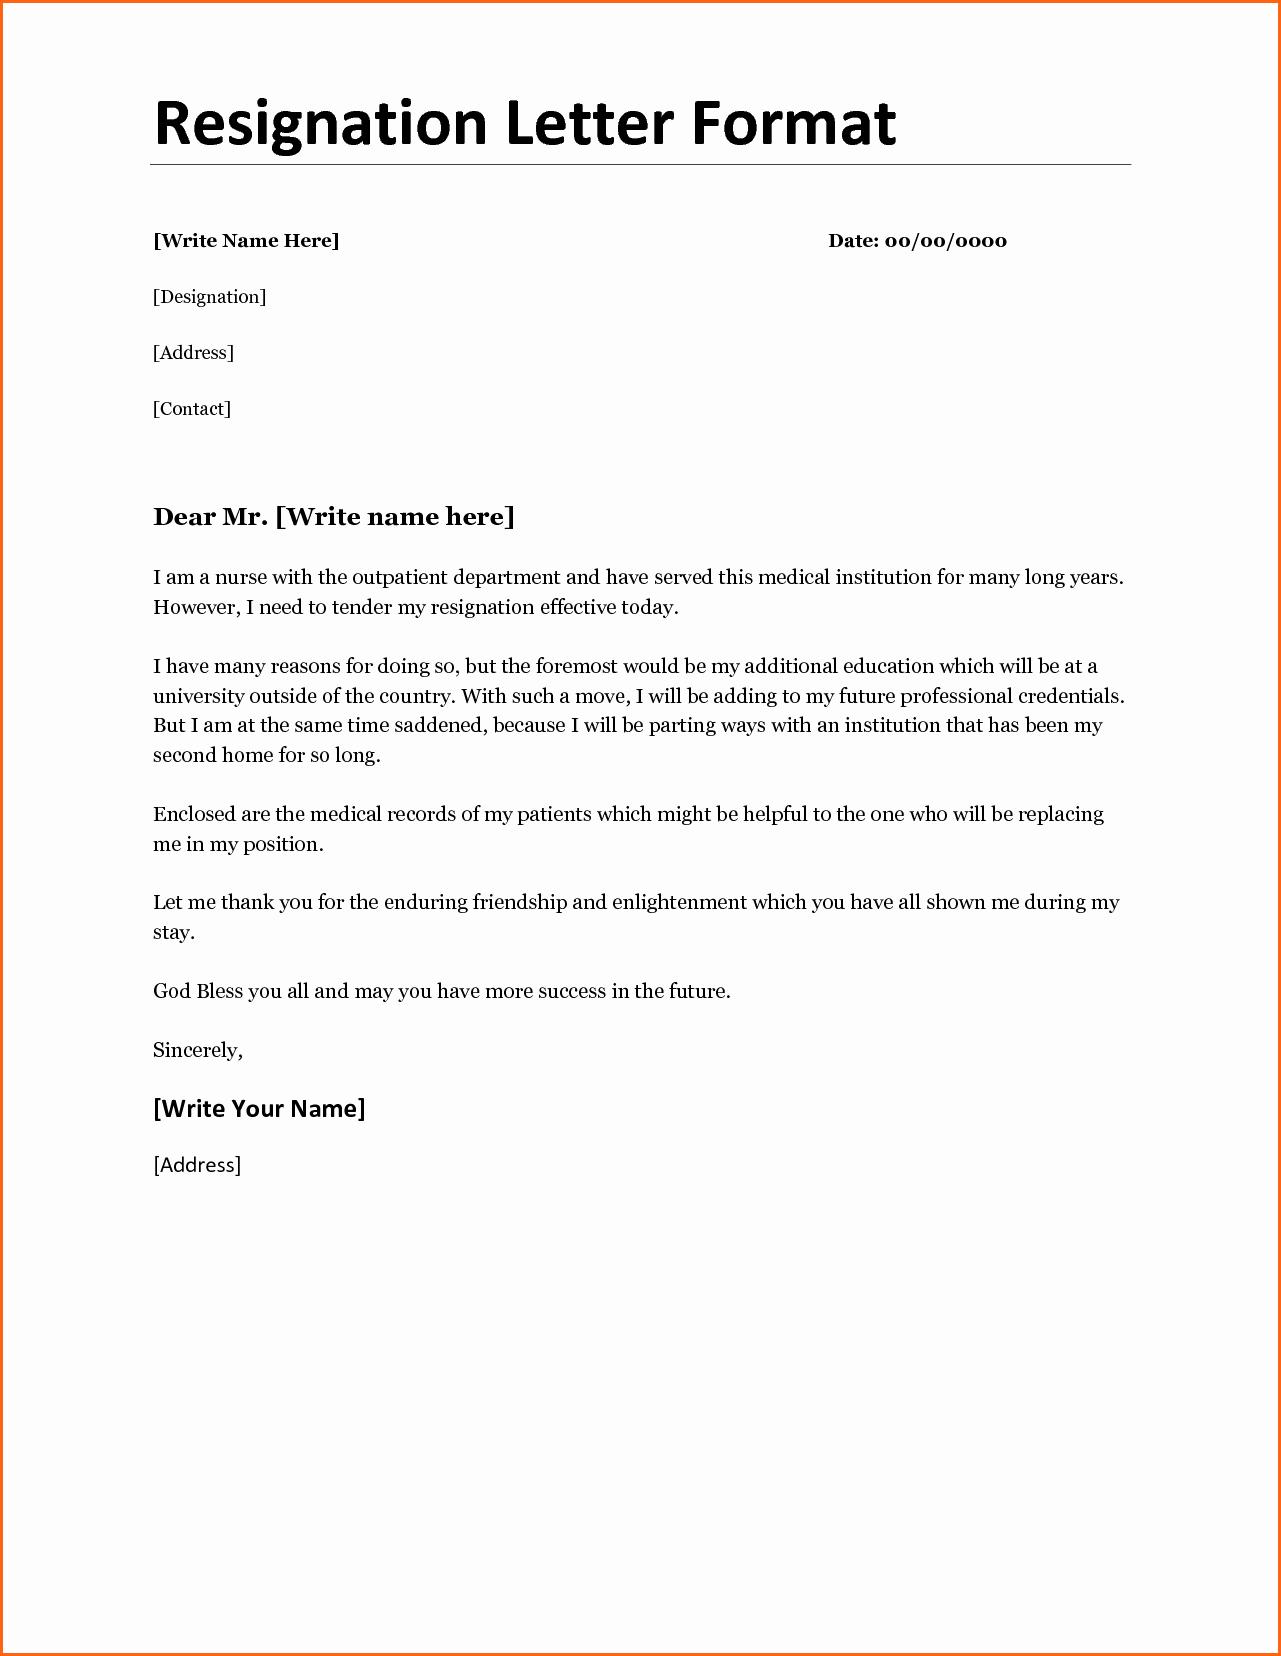 Template for Letter Of Resignation Inspirational 11 Resignation Letter format Bud Template Letter